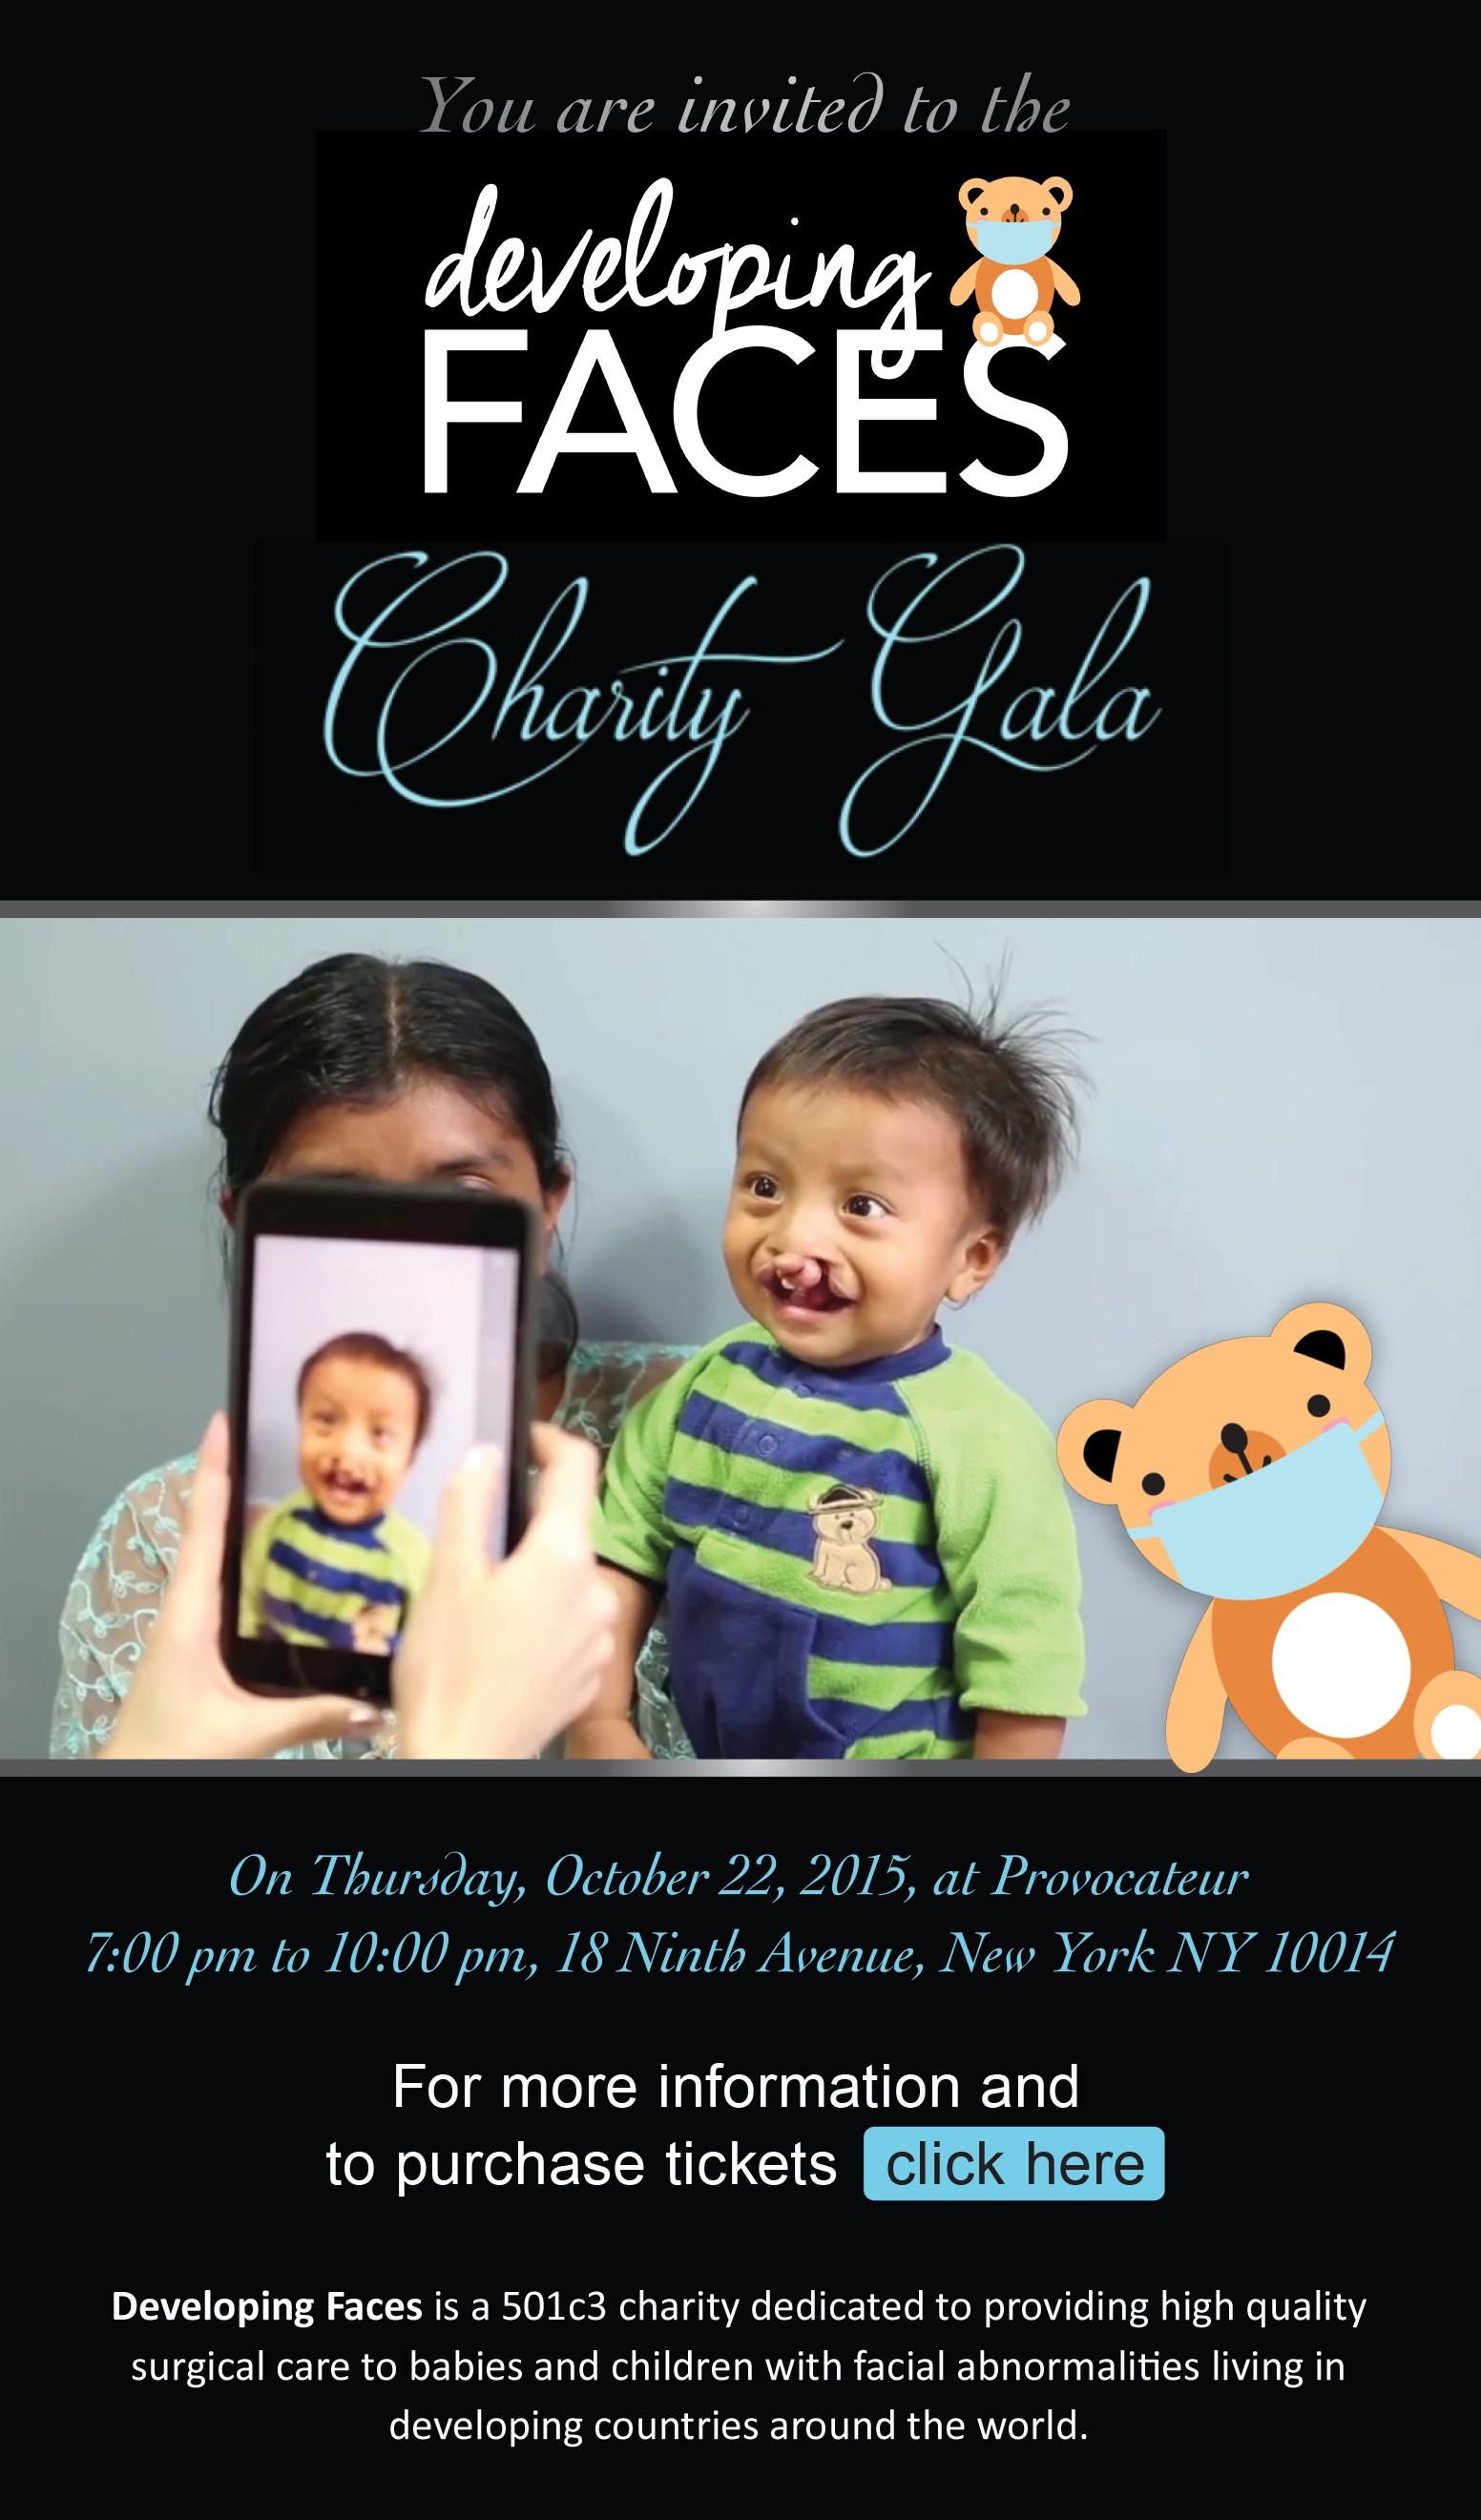 Invitation for Charity Gala